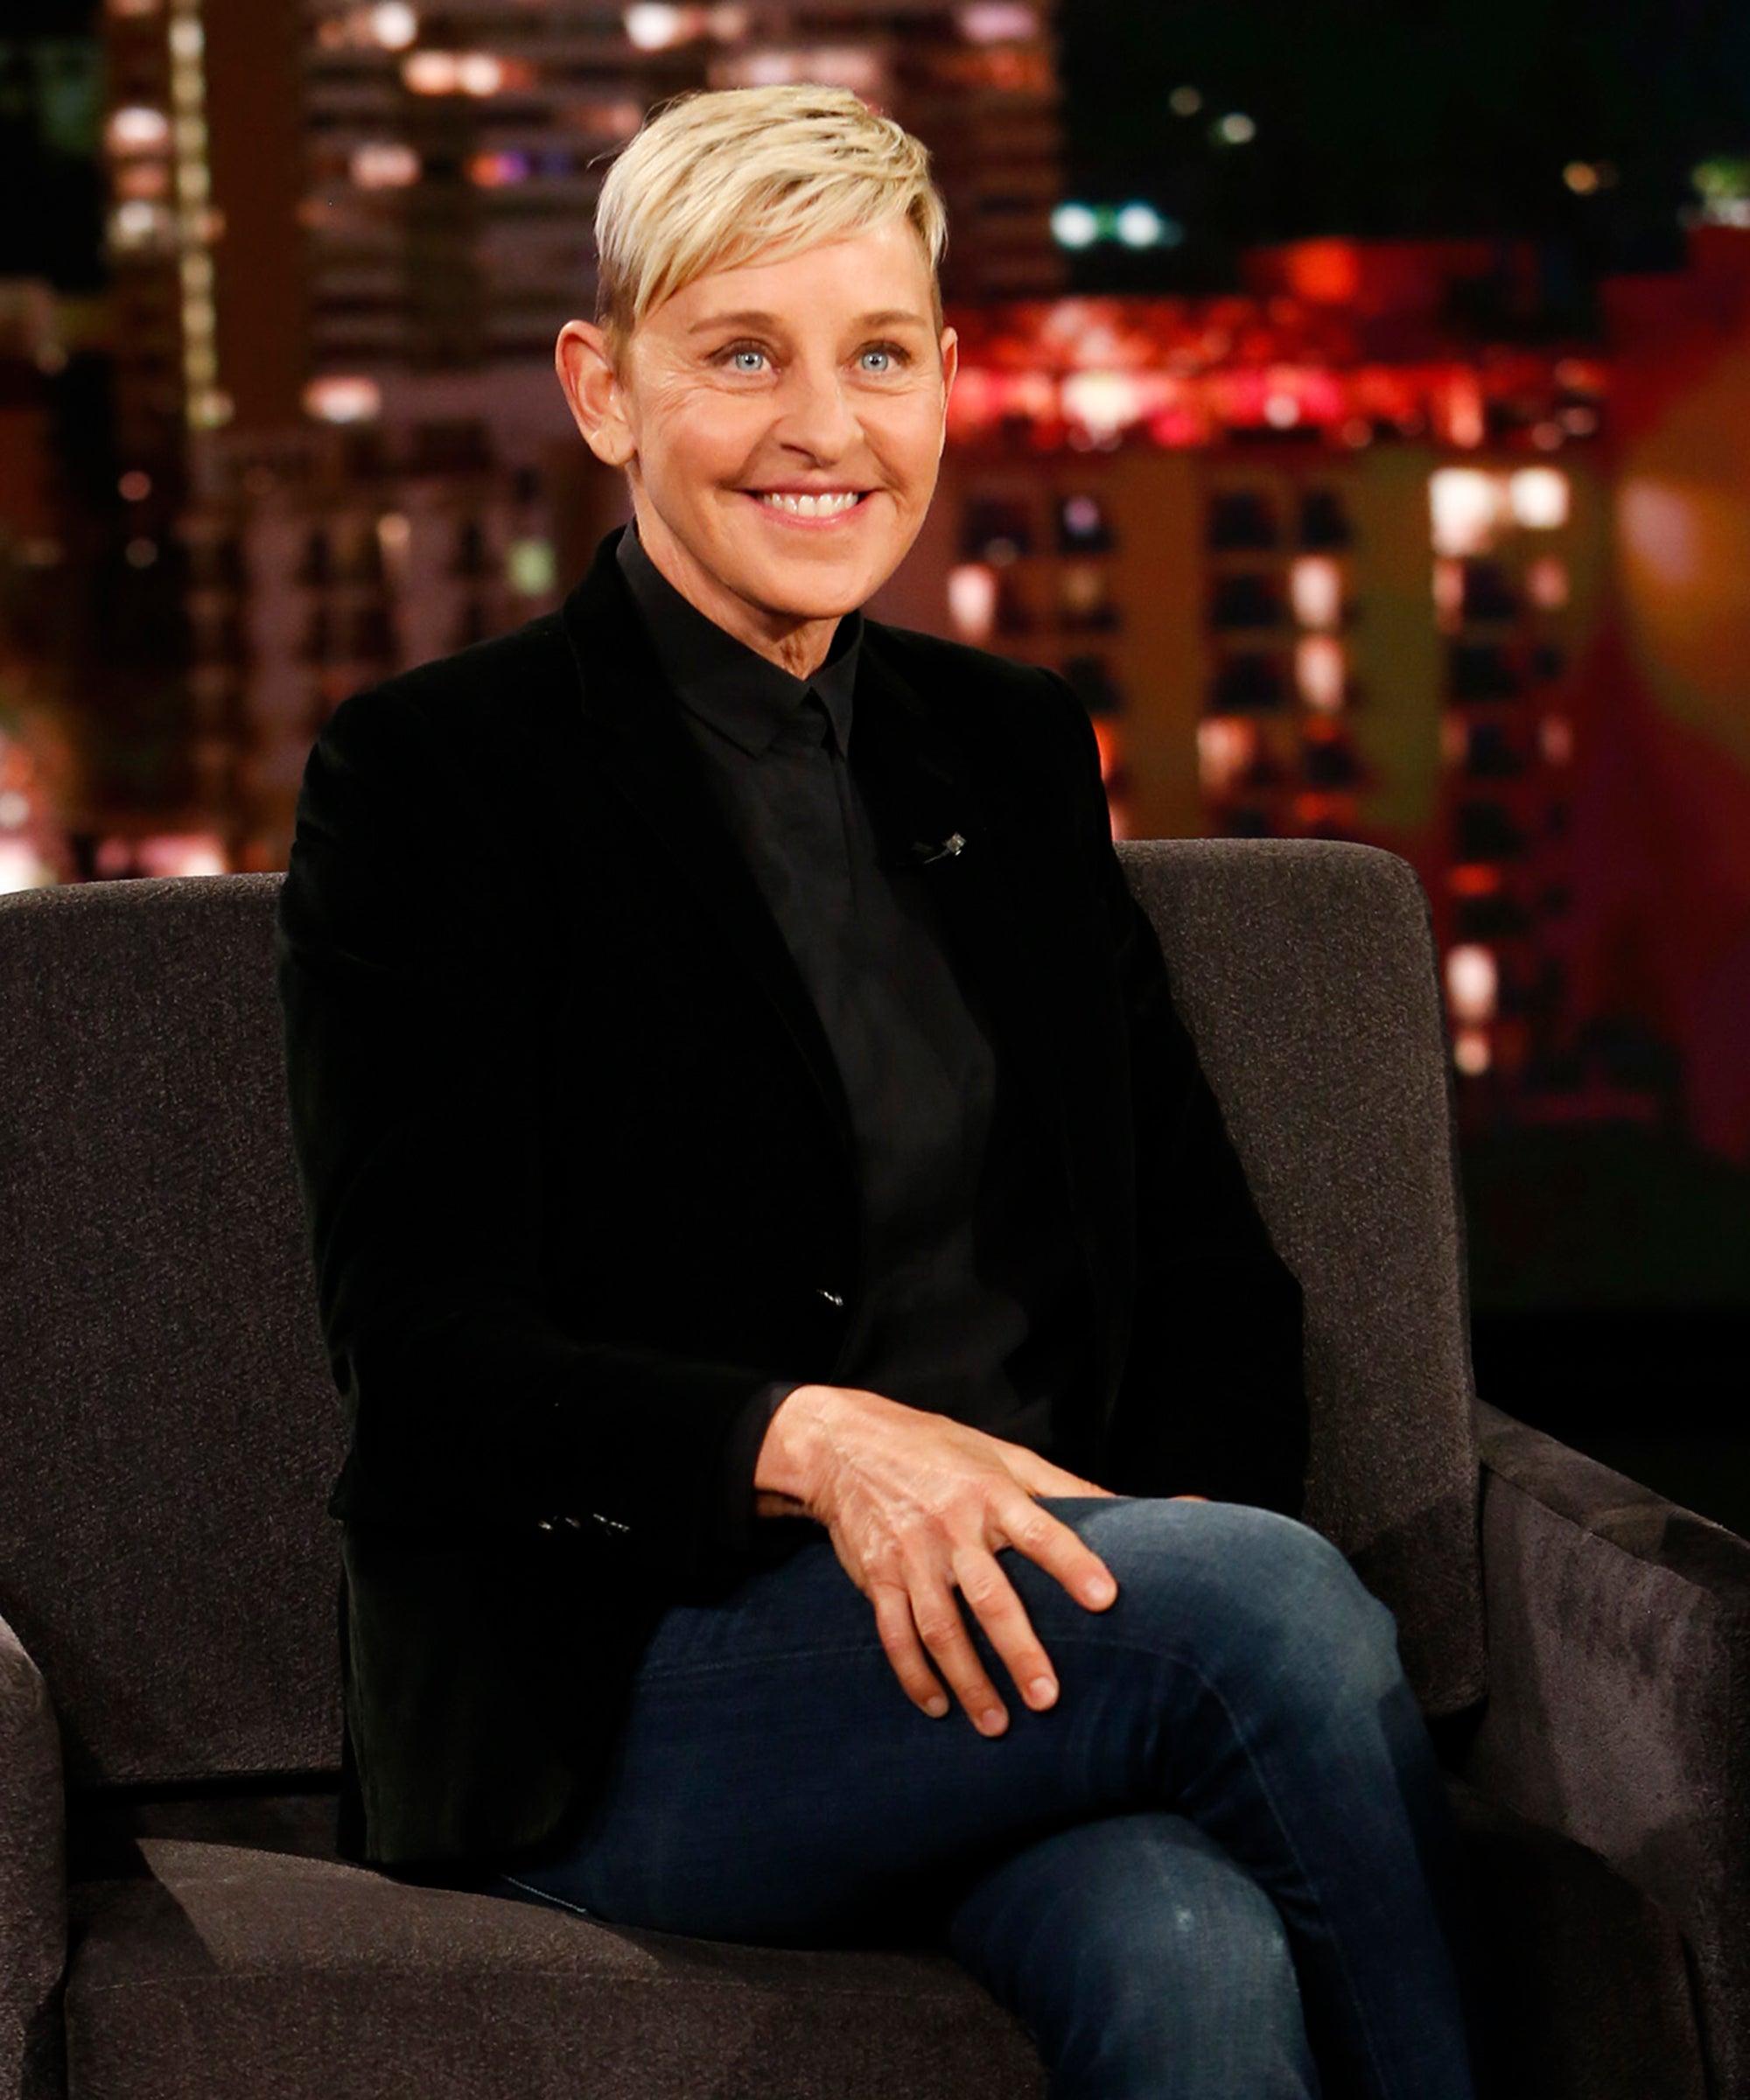 Brad Pitt & Ellen DeGeneres Apparently Share The Same Ex-Girlfriend